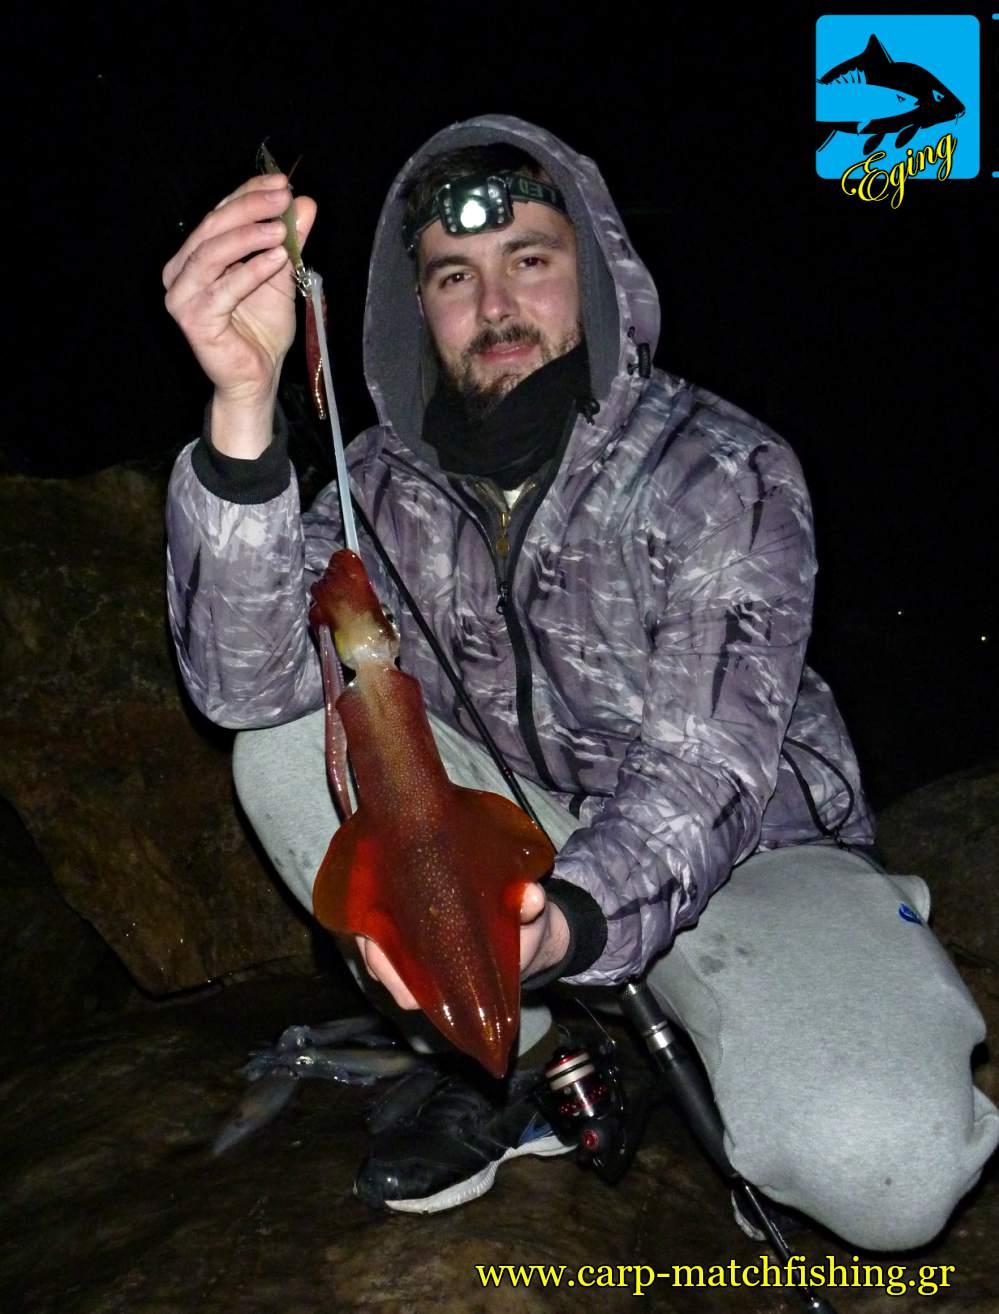 eging night squid topoi kalamarion carpmatchfishing